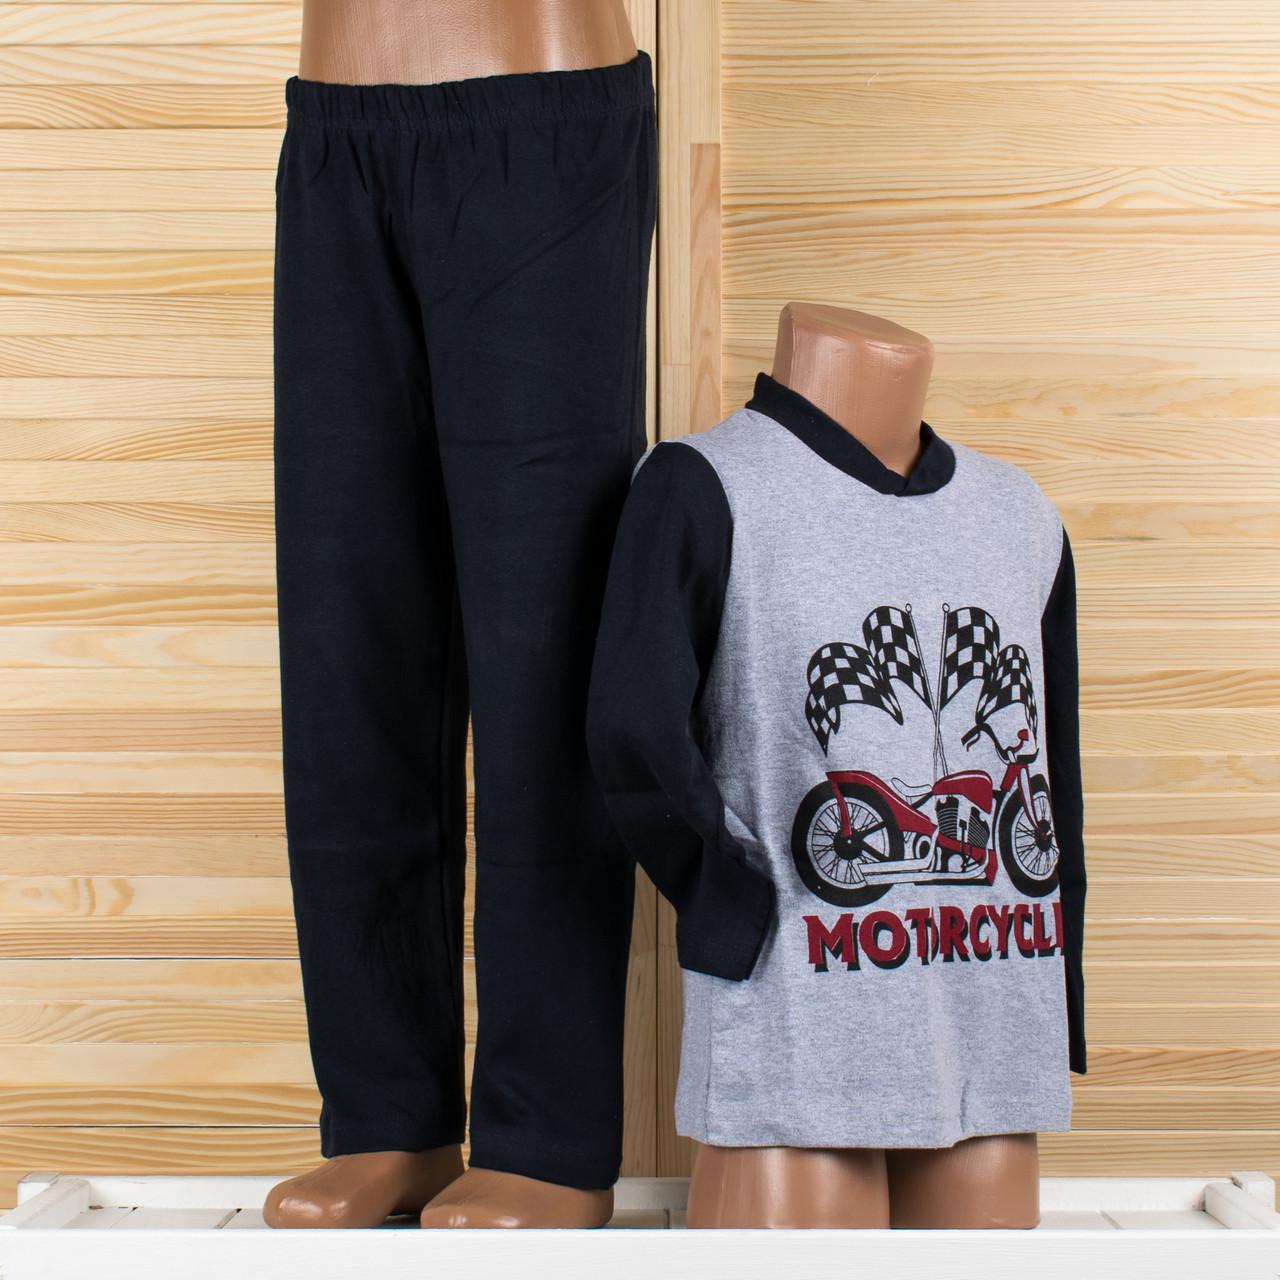 Детская пижама на мальчика Турция. Moral 07-3 2/3. Размер на 2/3 года.